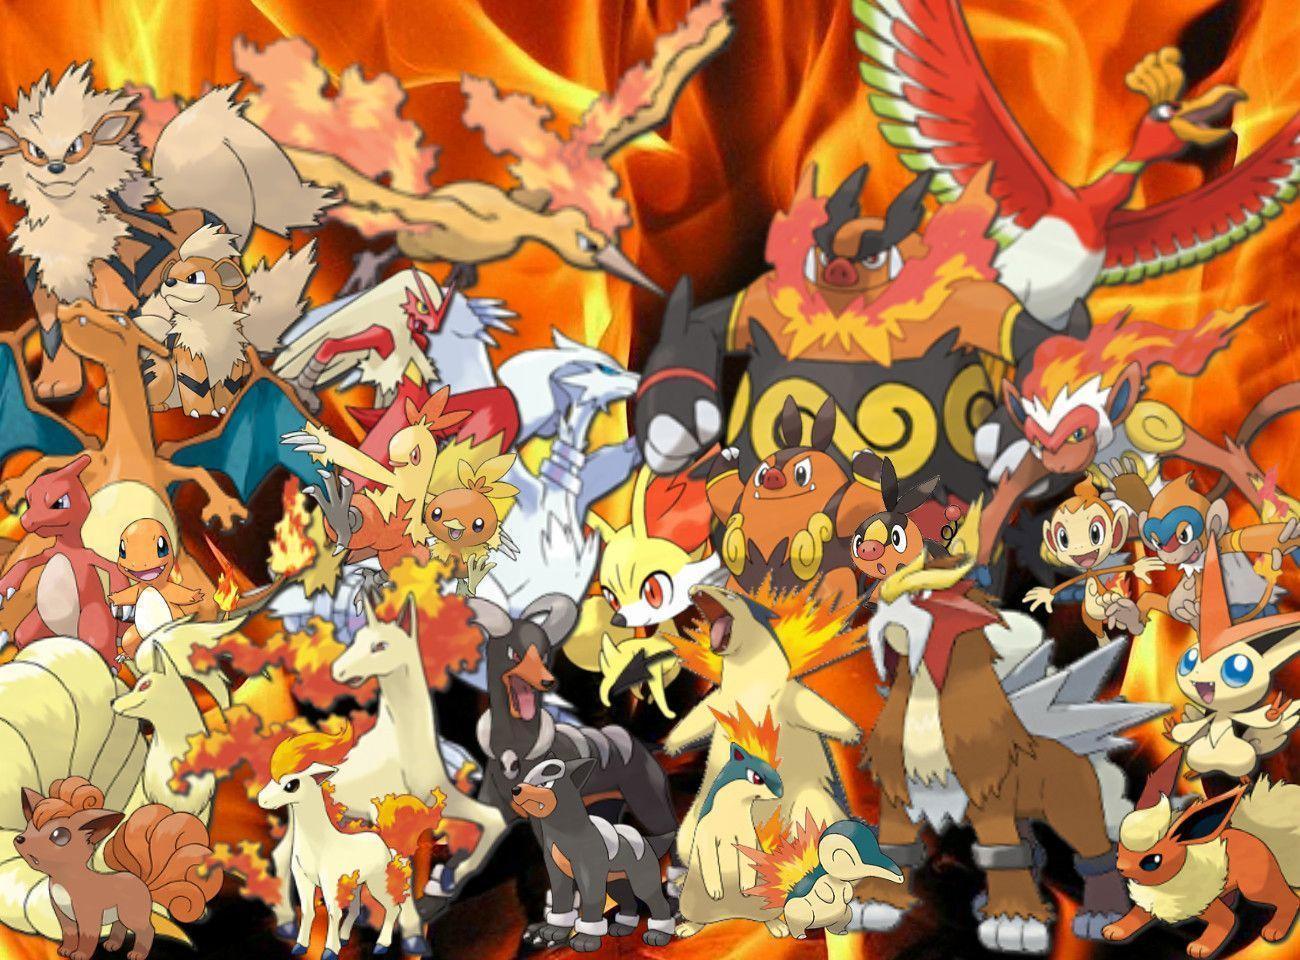 Pokémon Fire Type strategy, guide, analysis